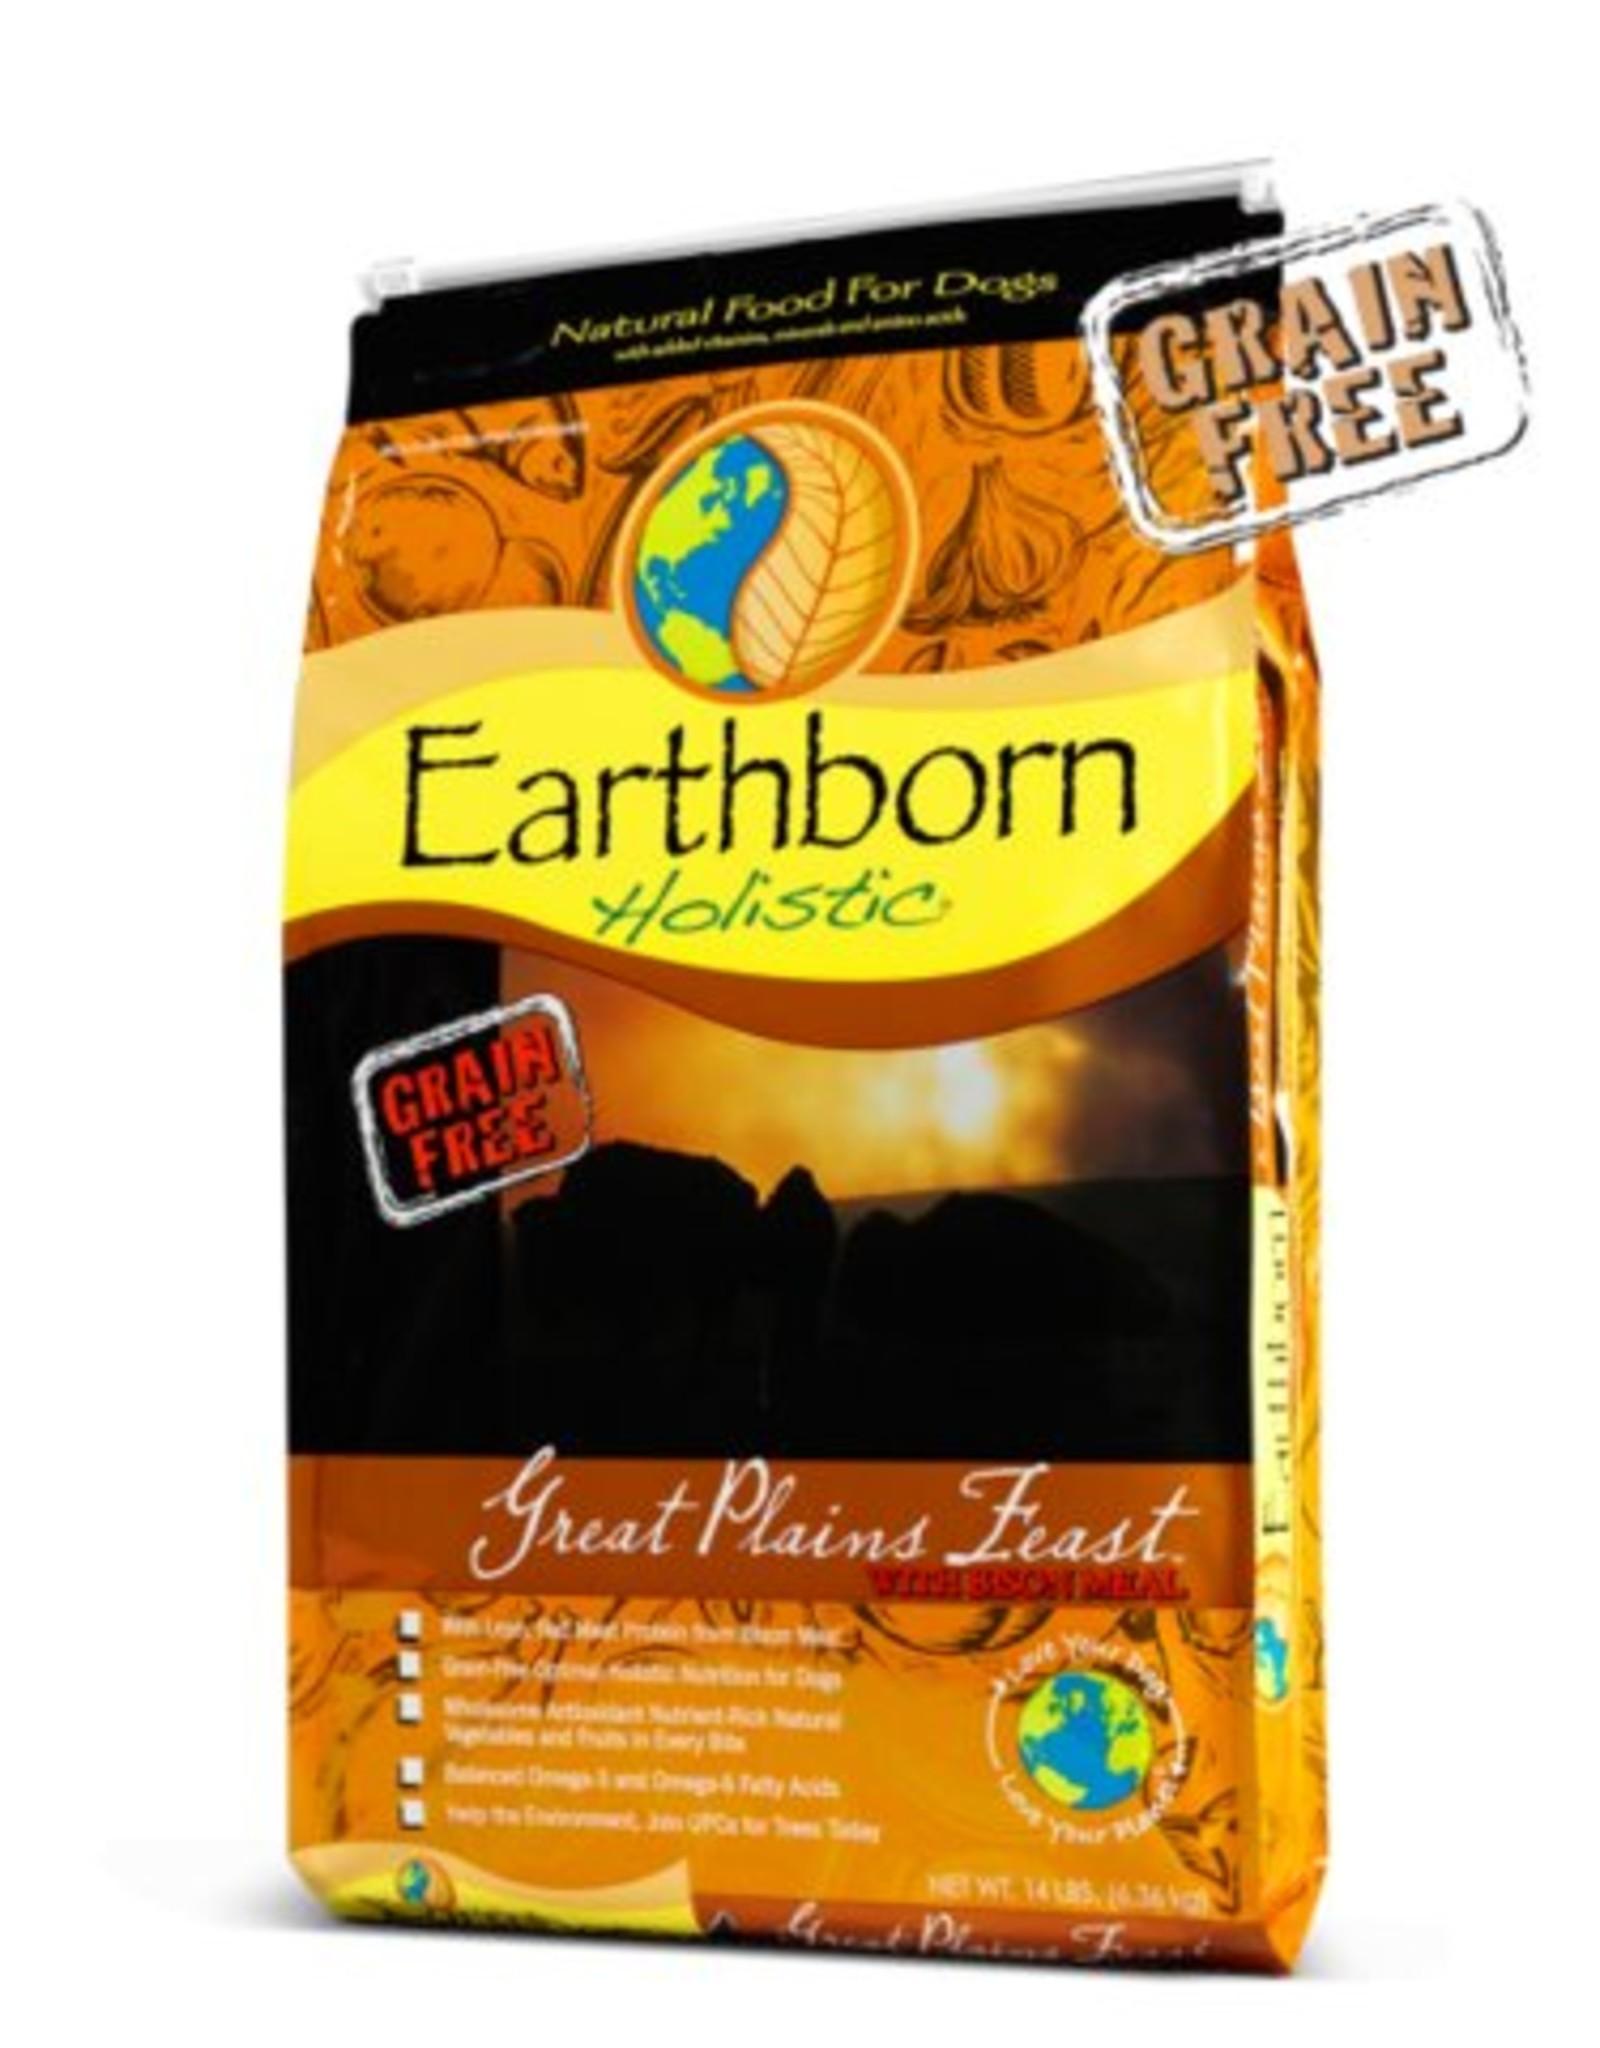 Earthborn Great Plains Feast Grain-Free Dry Dog Food